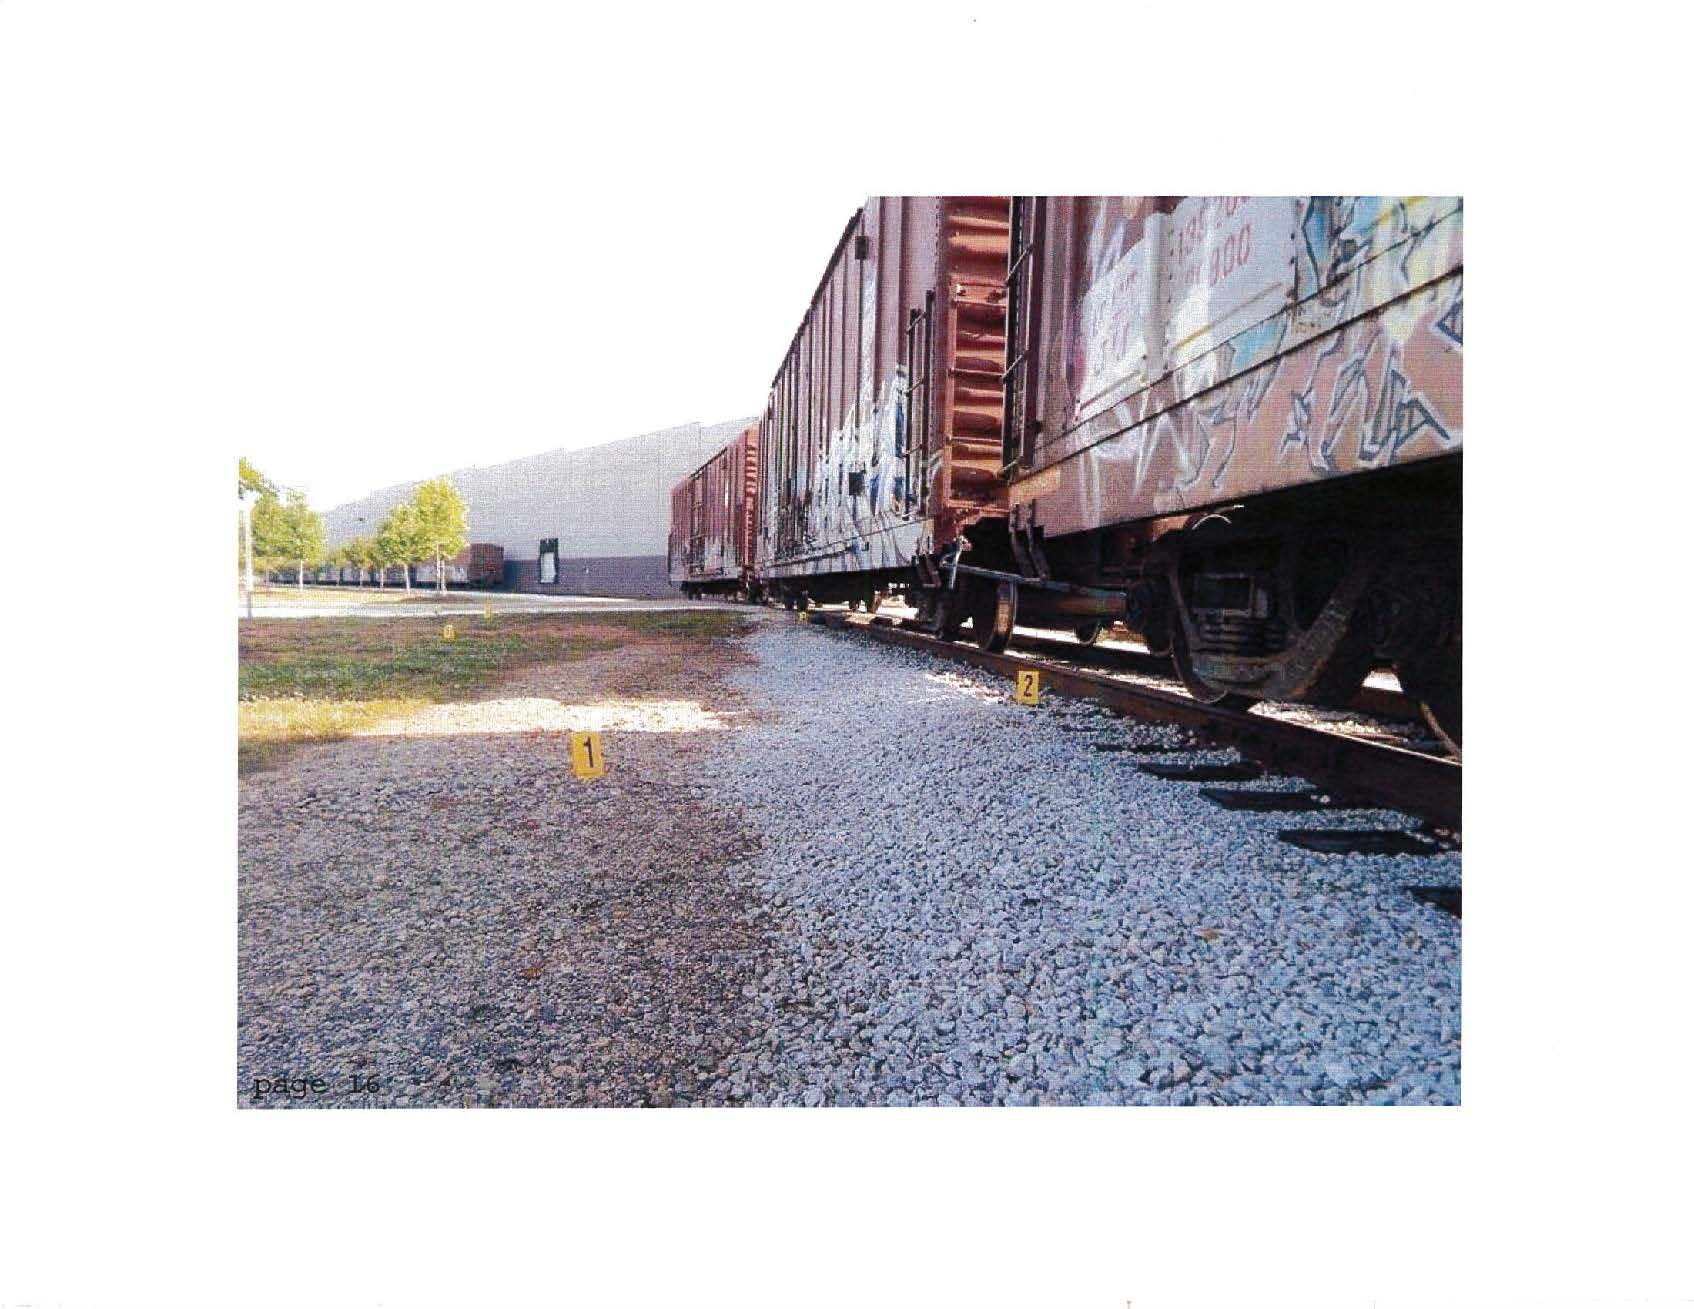 https://i0.wp.com/steel-moss.com/wp-content/uploads/2020/06/20_CSX-Photo-of-Scene.jpg?fit=1694%2C1309&ssl=1